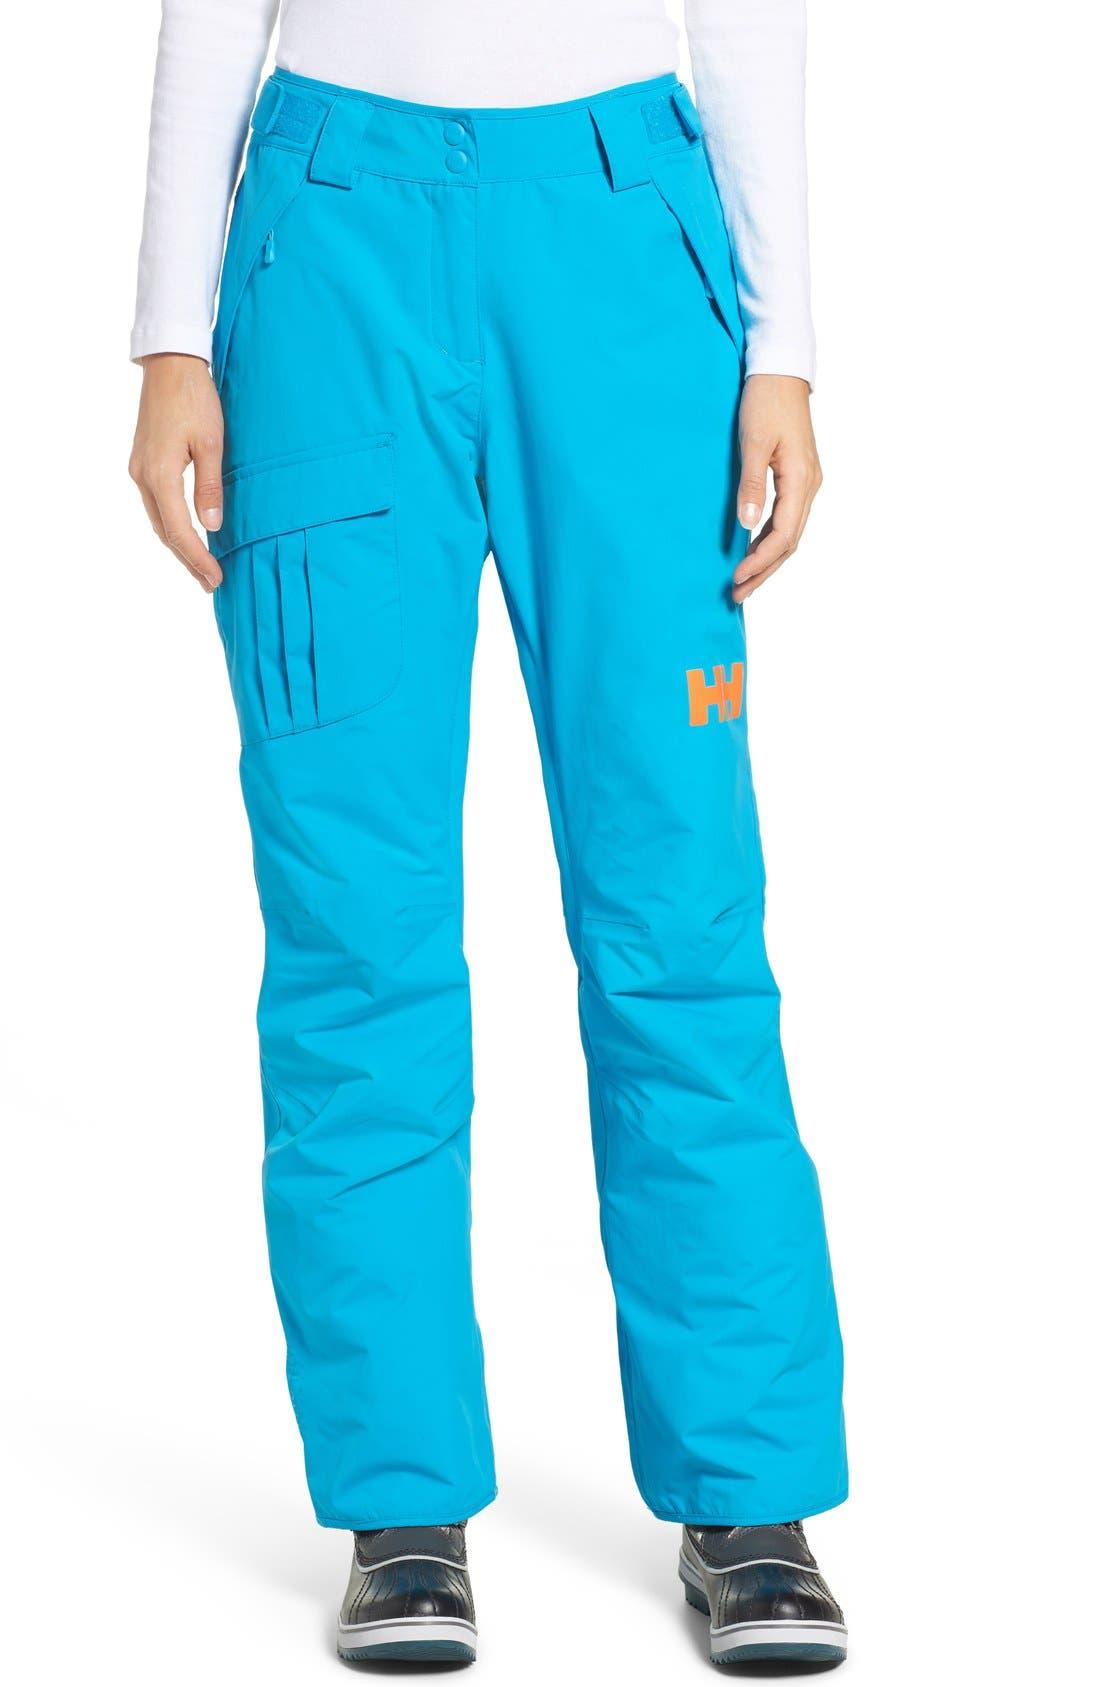 Helly Hansen Sensation Ski Pants